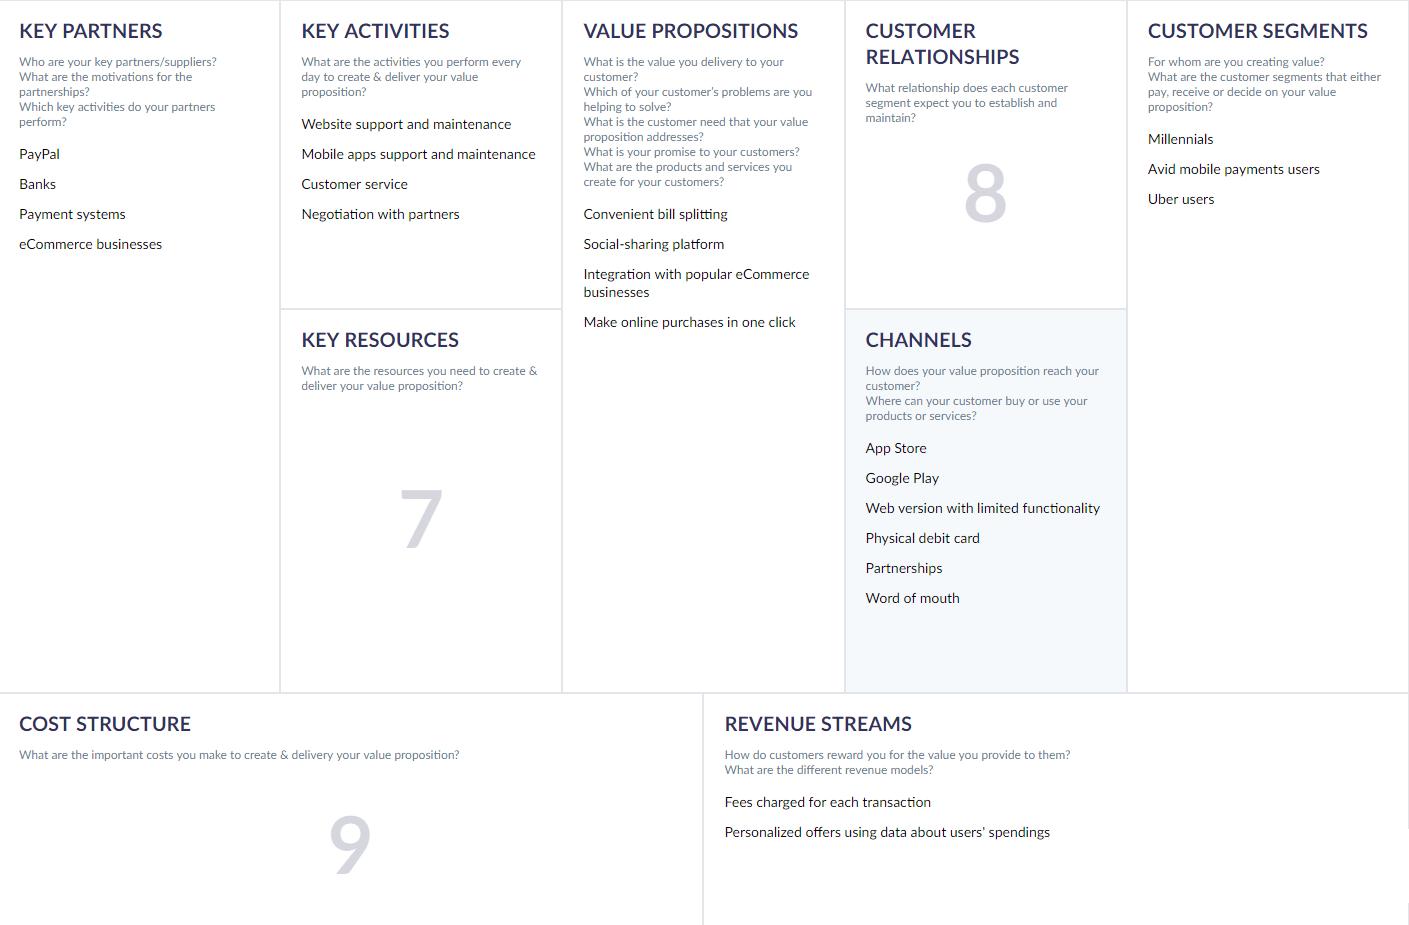 Venmo's Distribution Channels